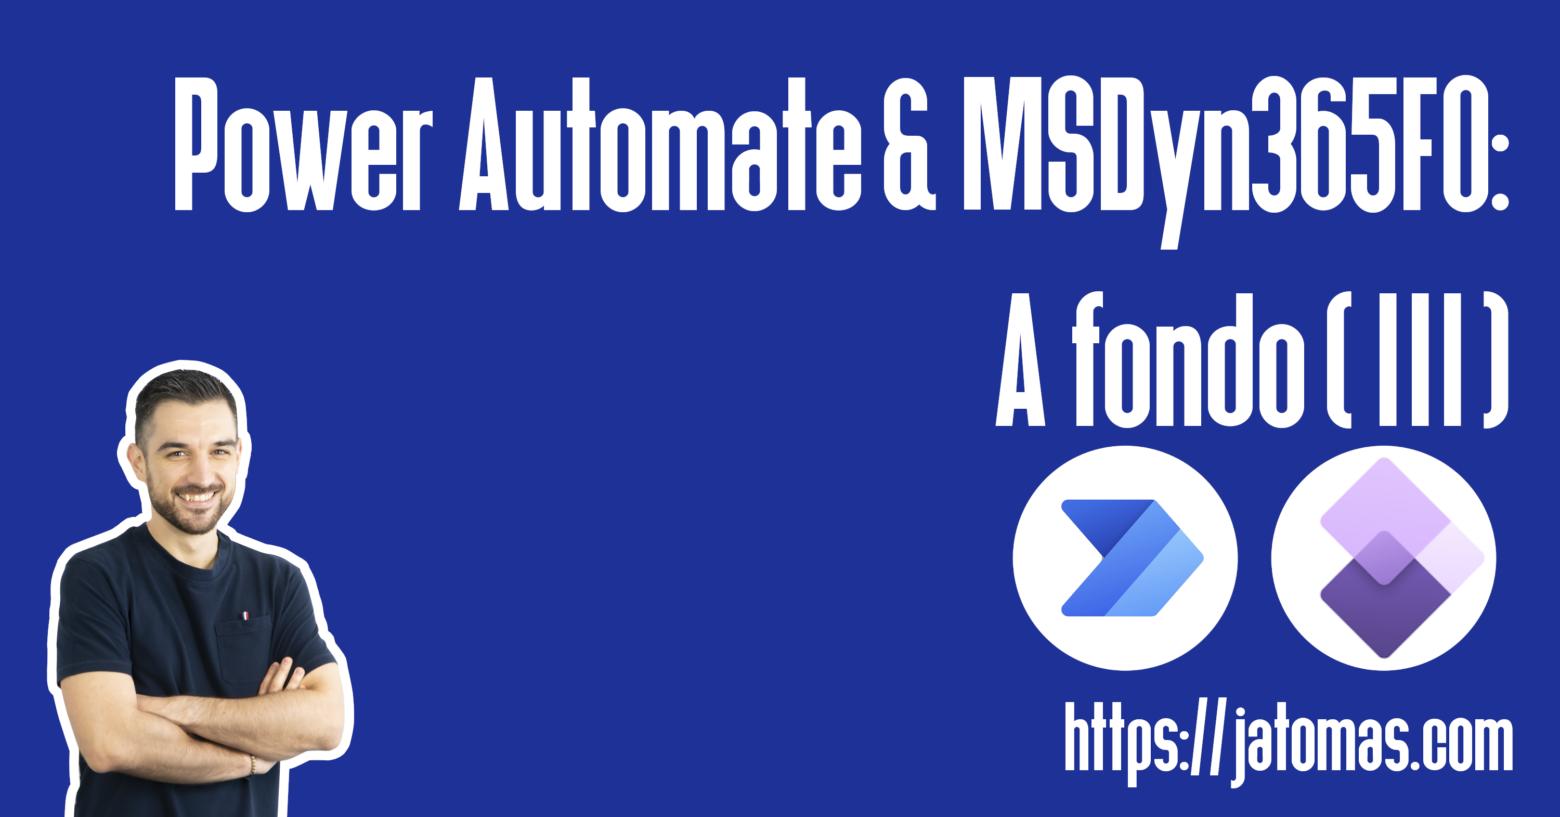 Power Automate & MSDyn365FO: A fondo (III)